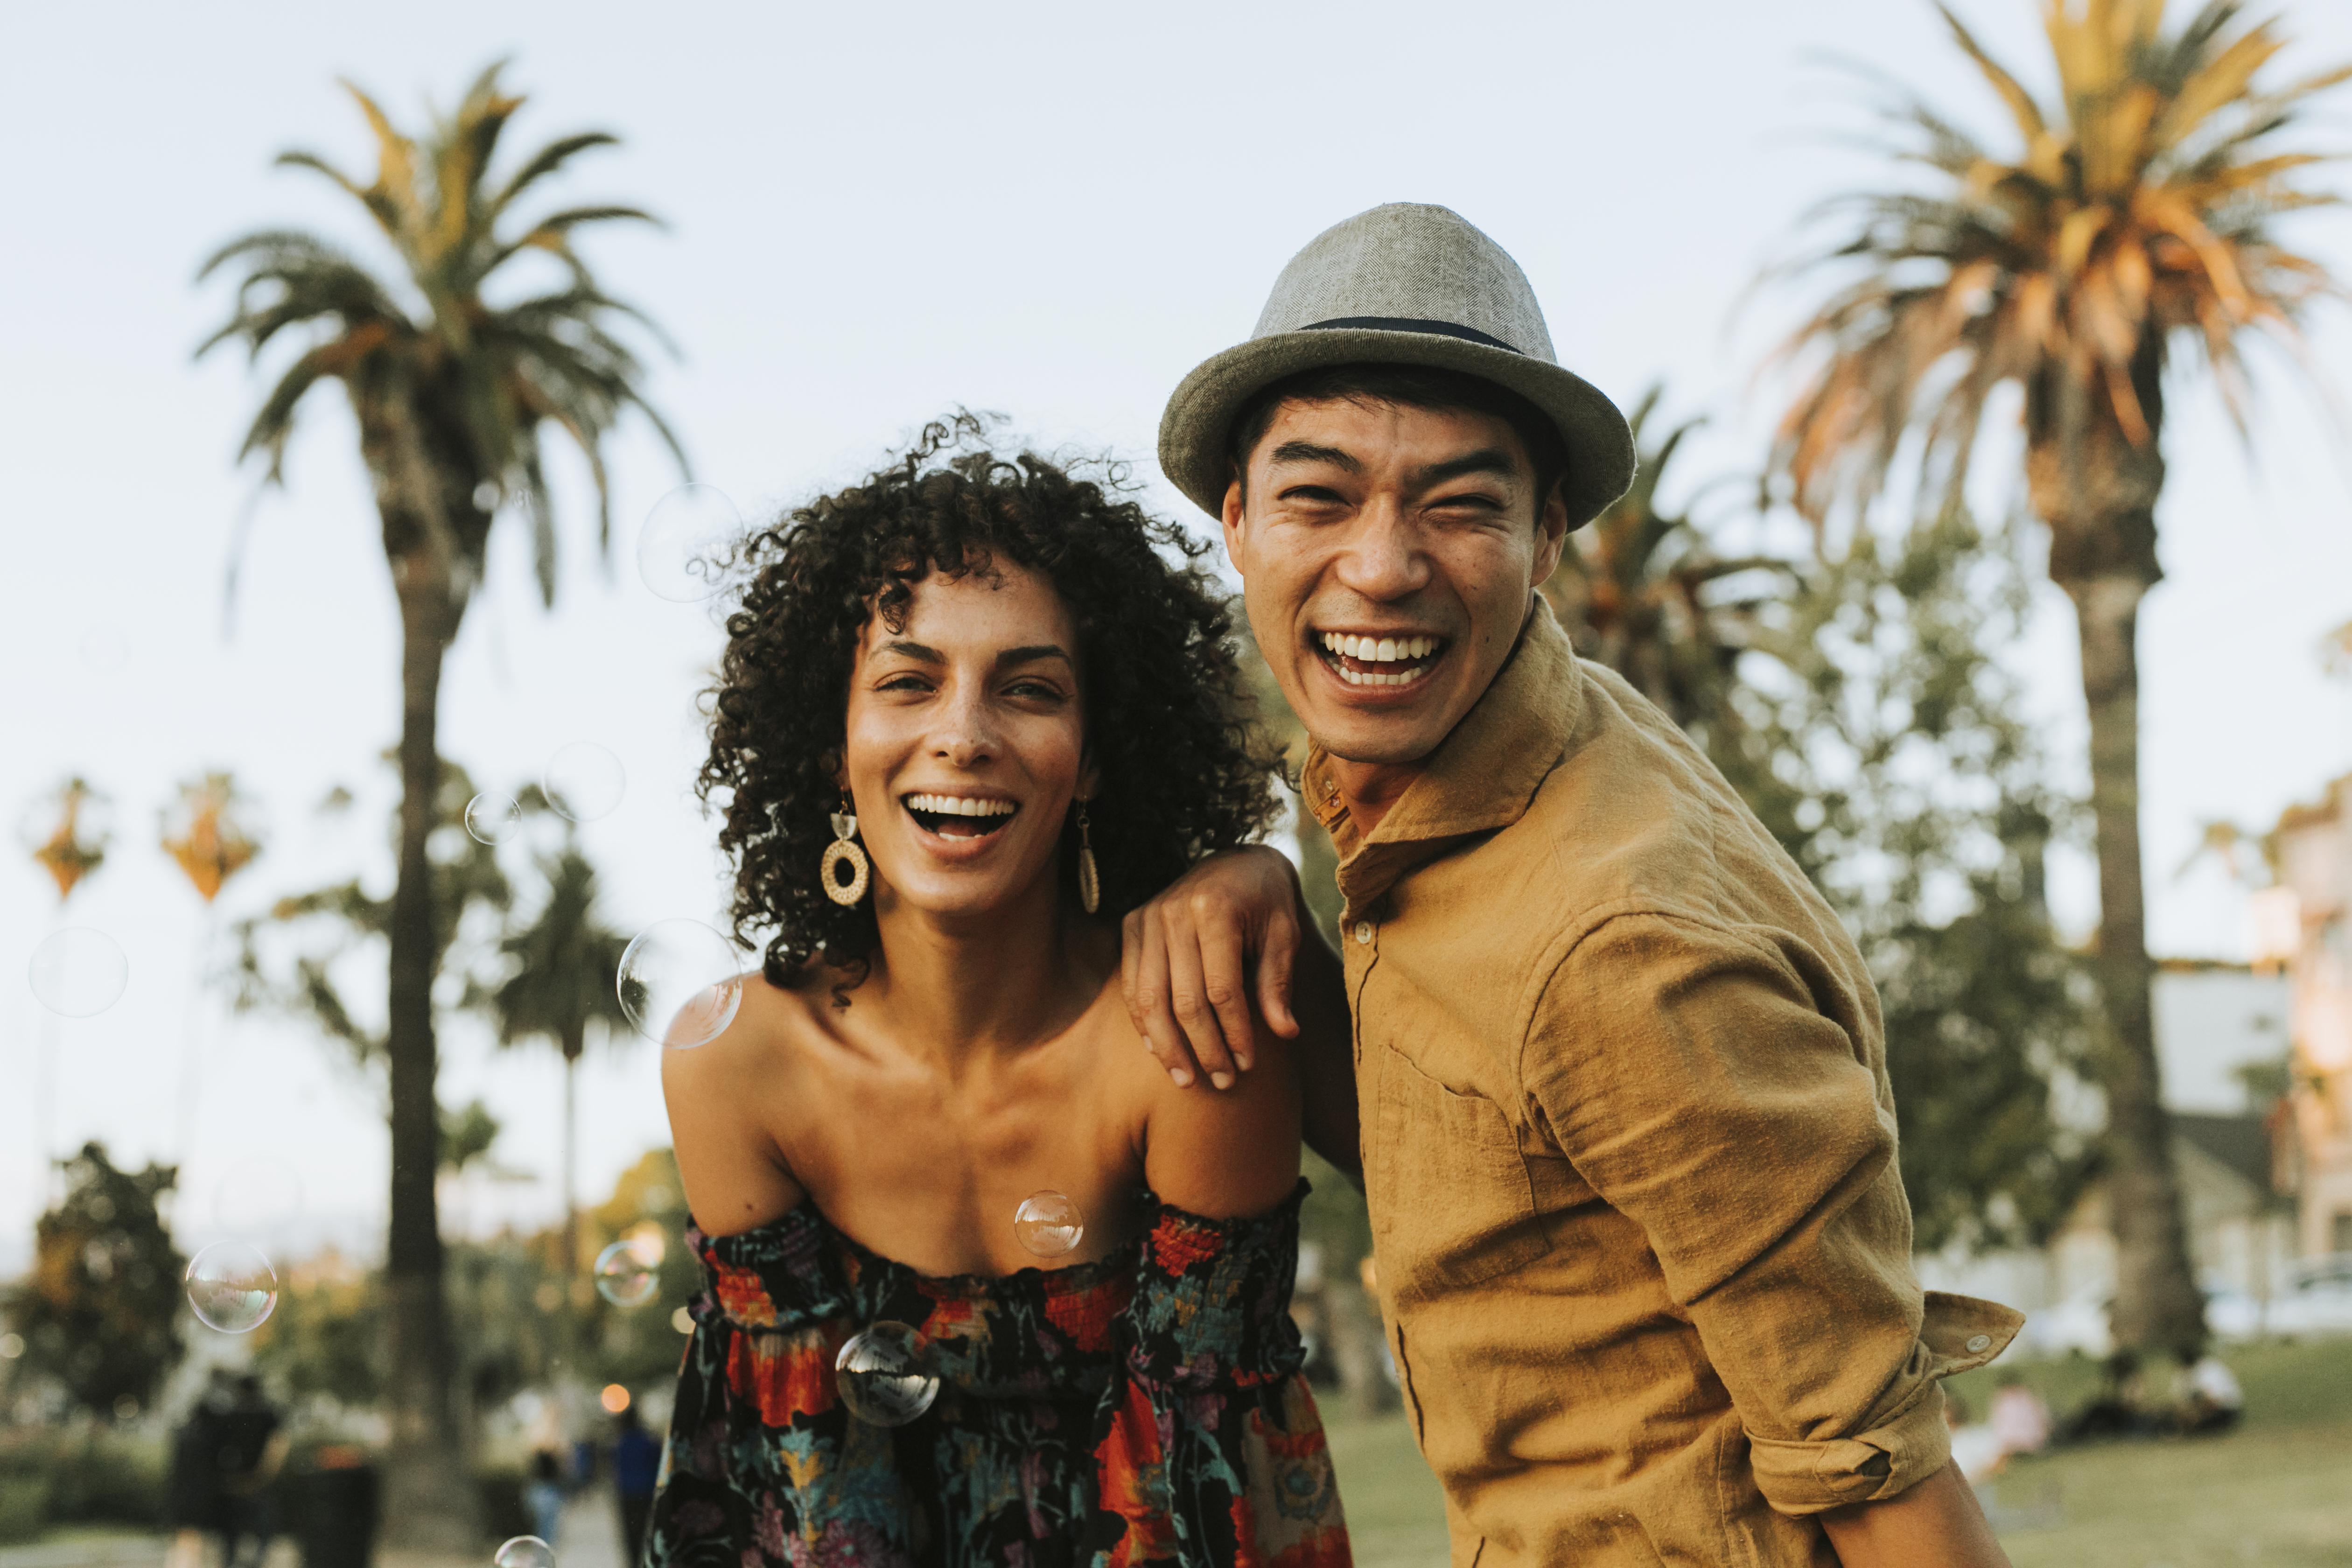 Interracial Dating Couple Happy